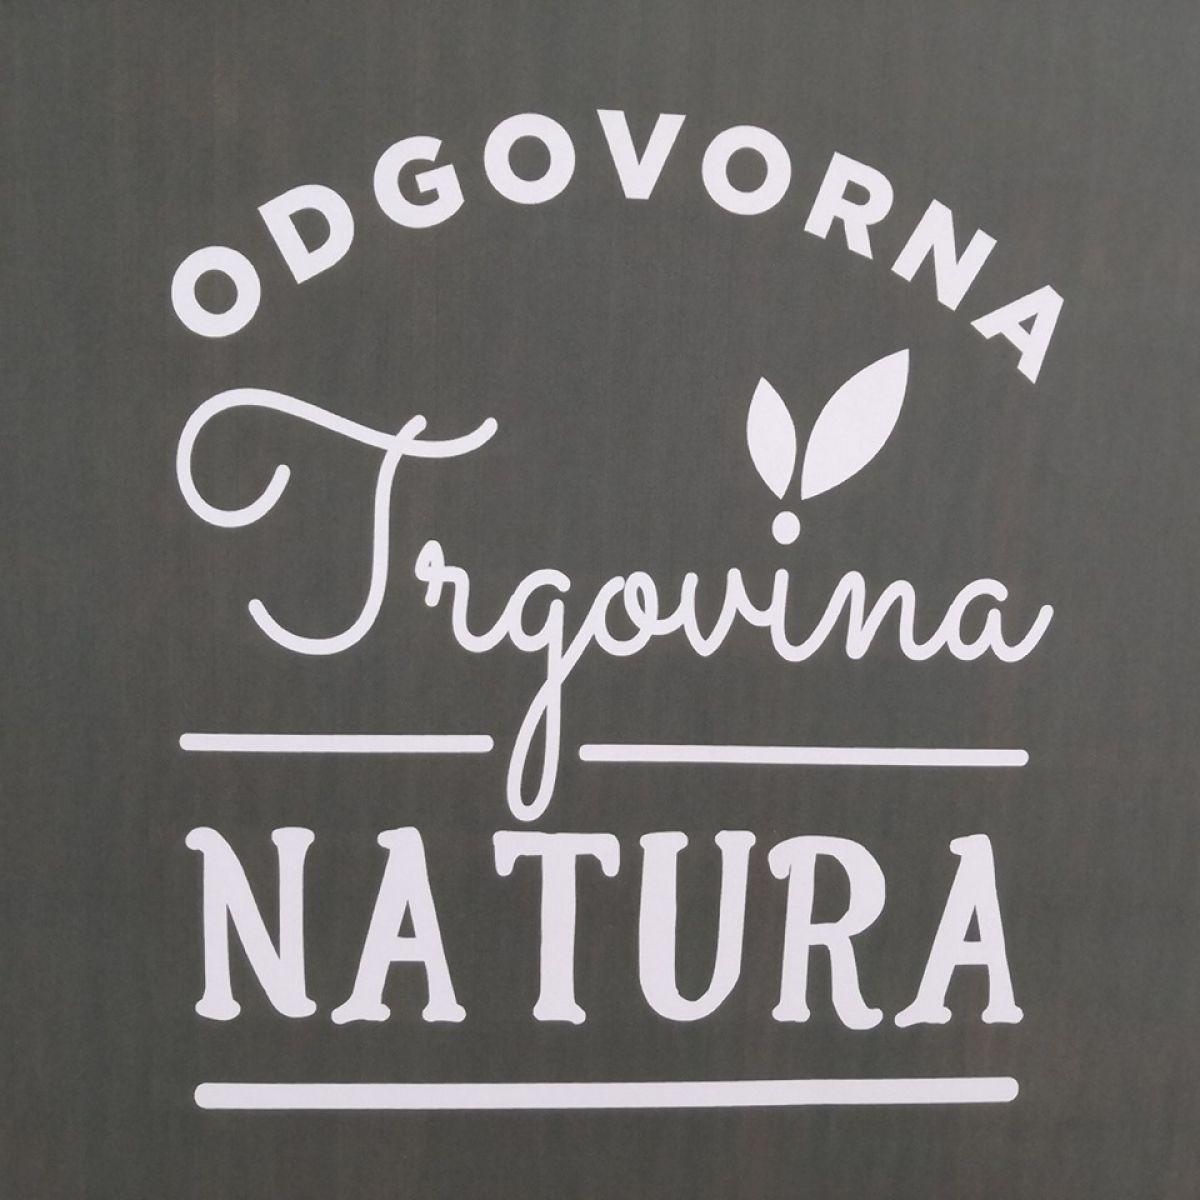 Uradna otvoritev Odgovorne trgovine Natura